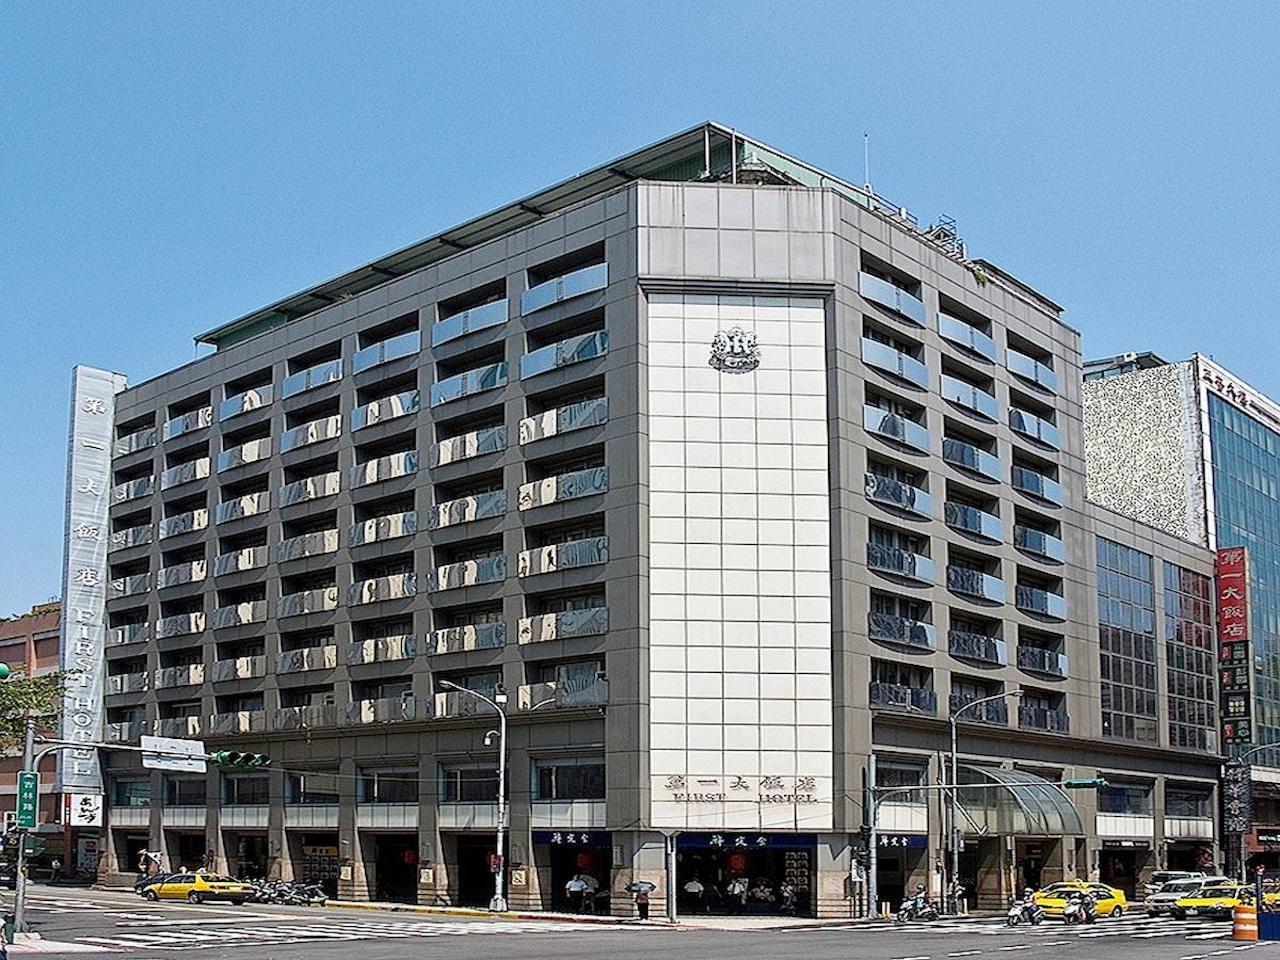 Taipei hotel firsthotel 03